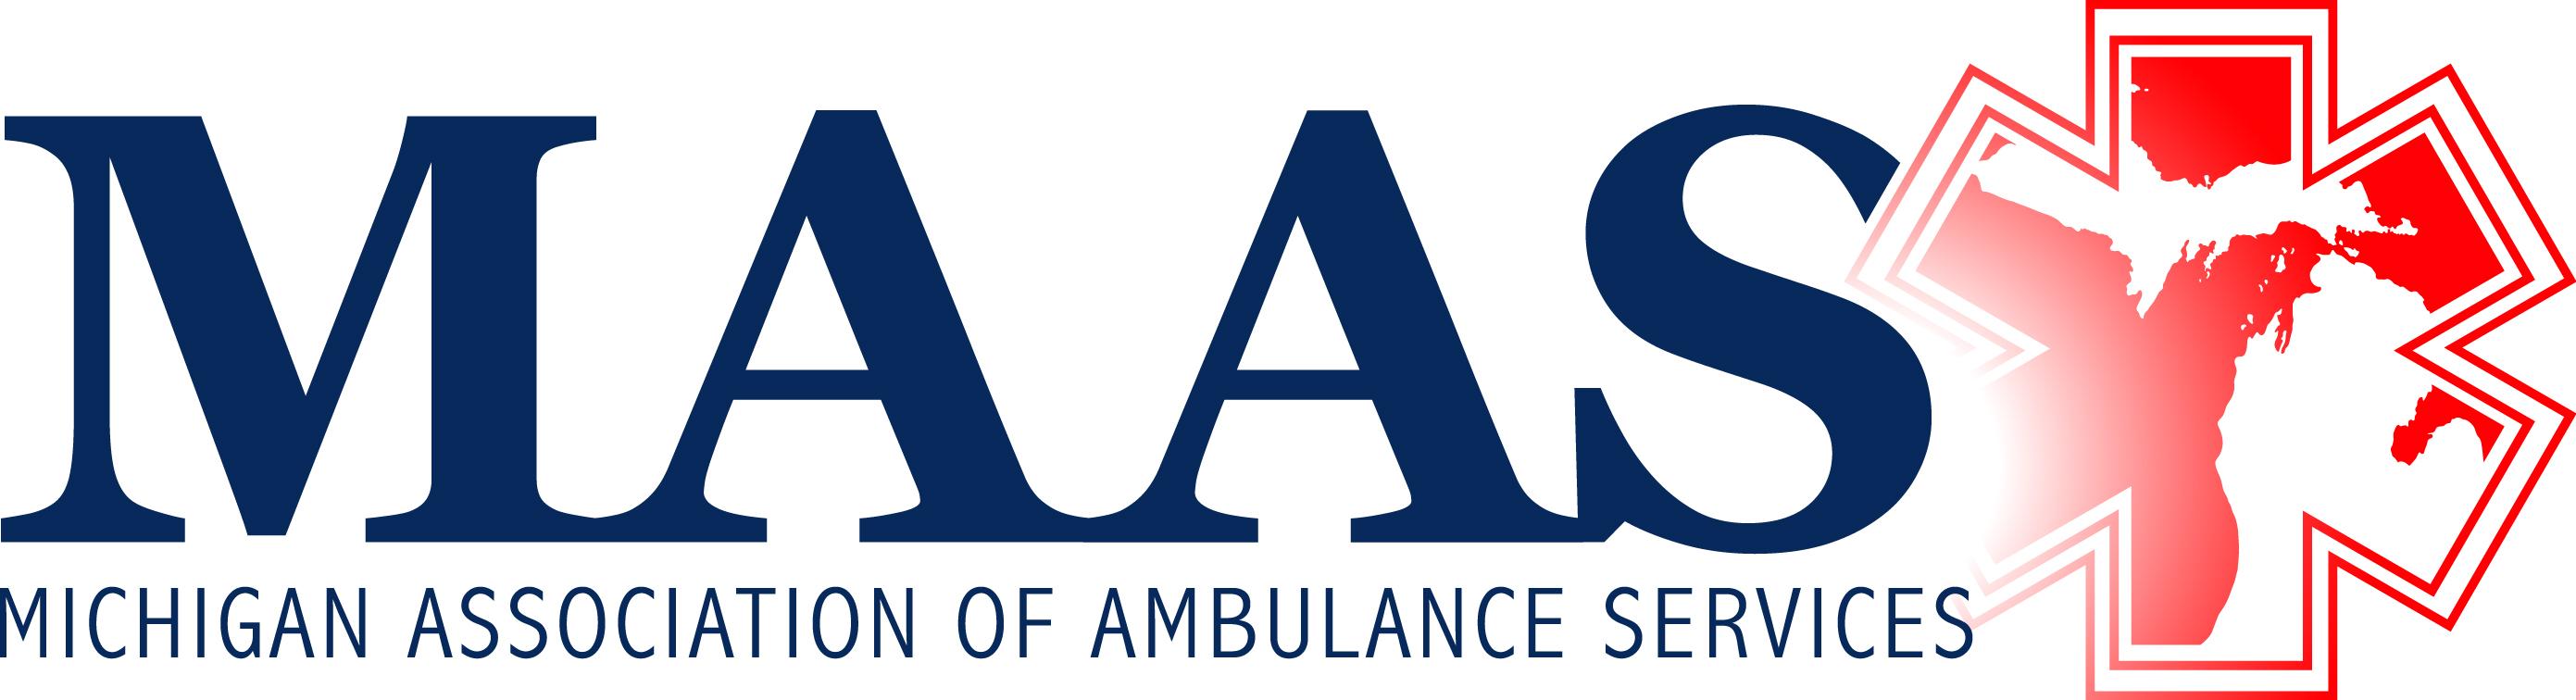 Michigan Association of Ambulance Services